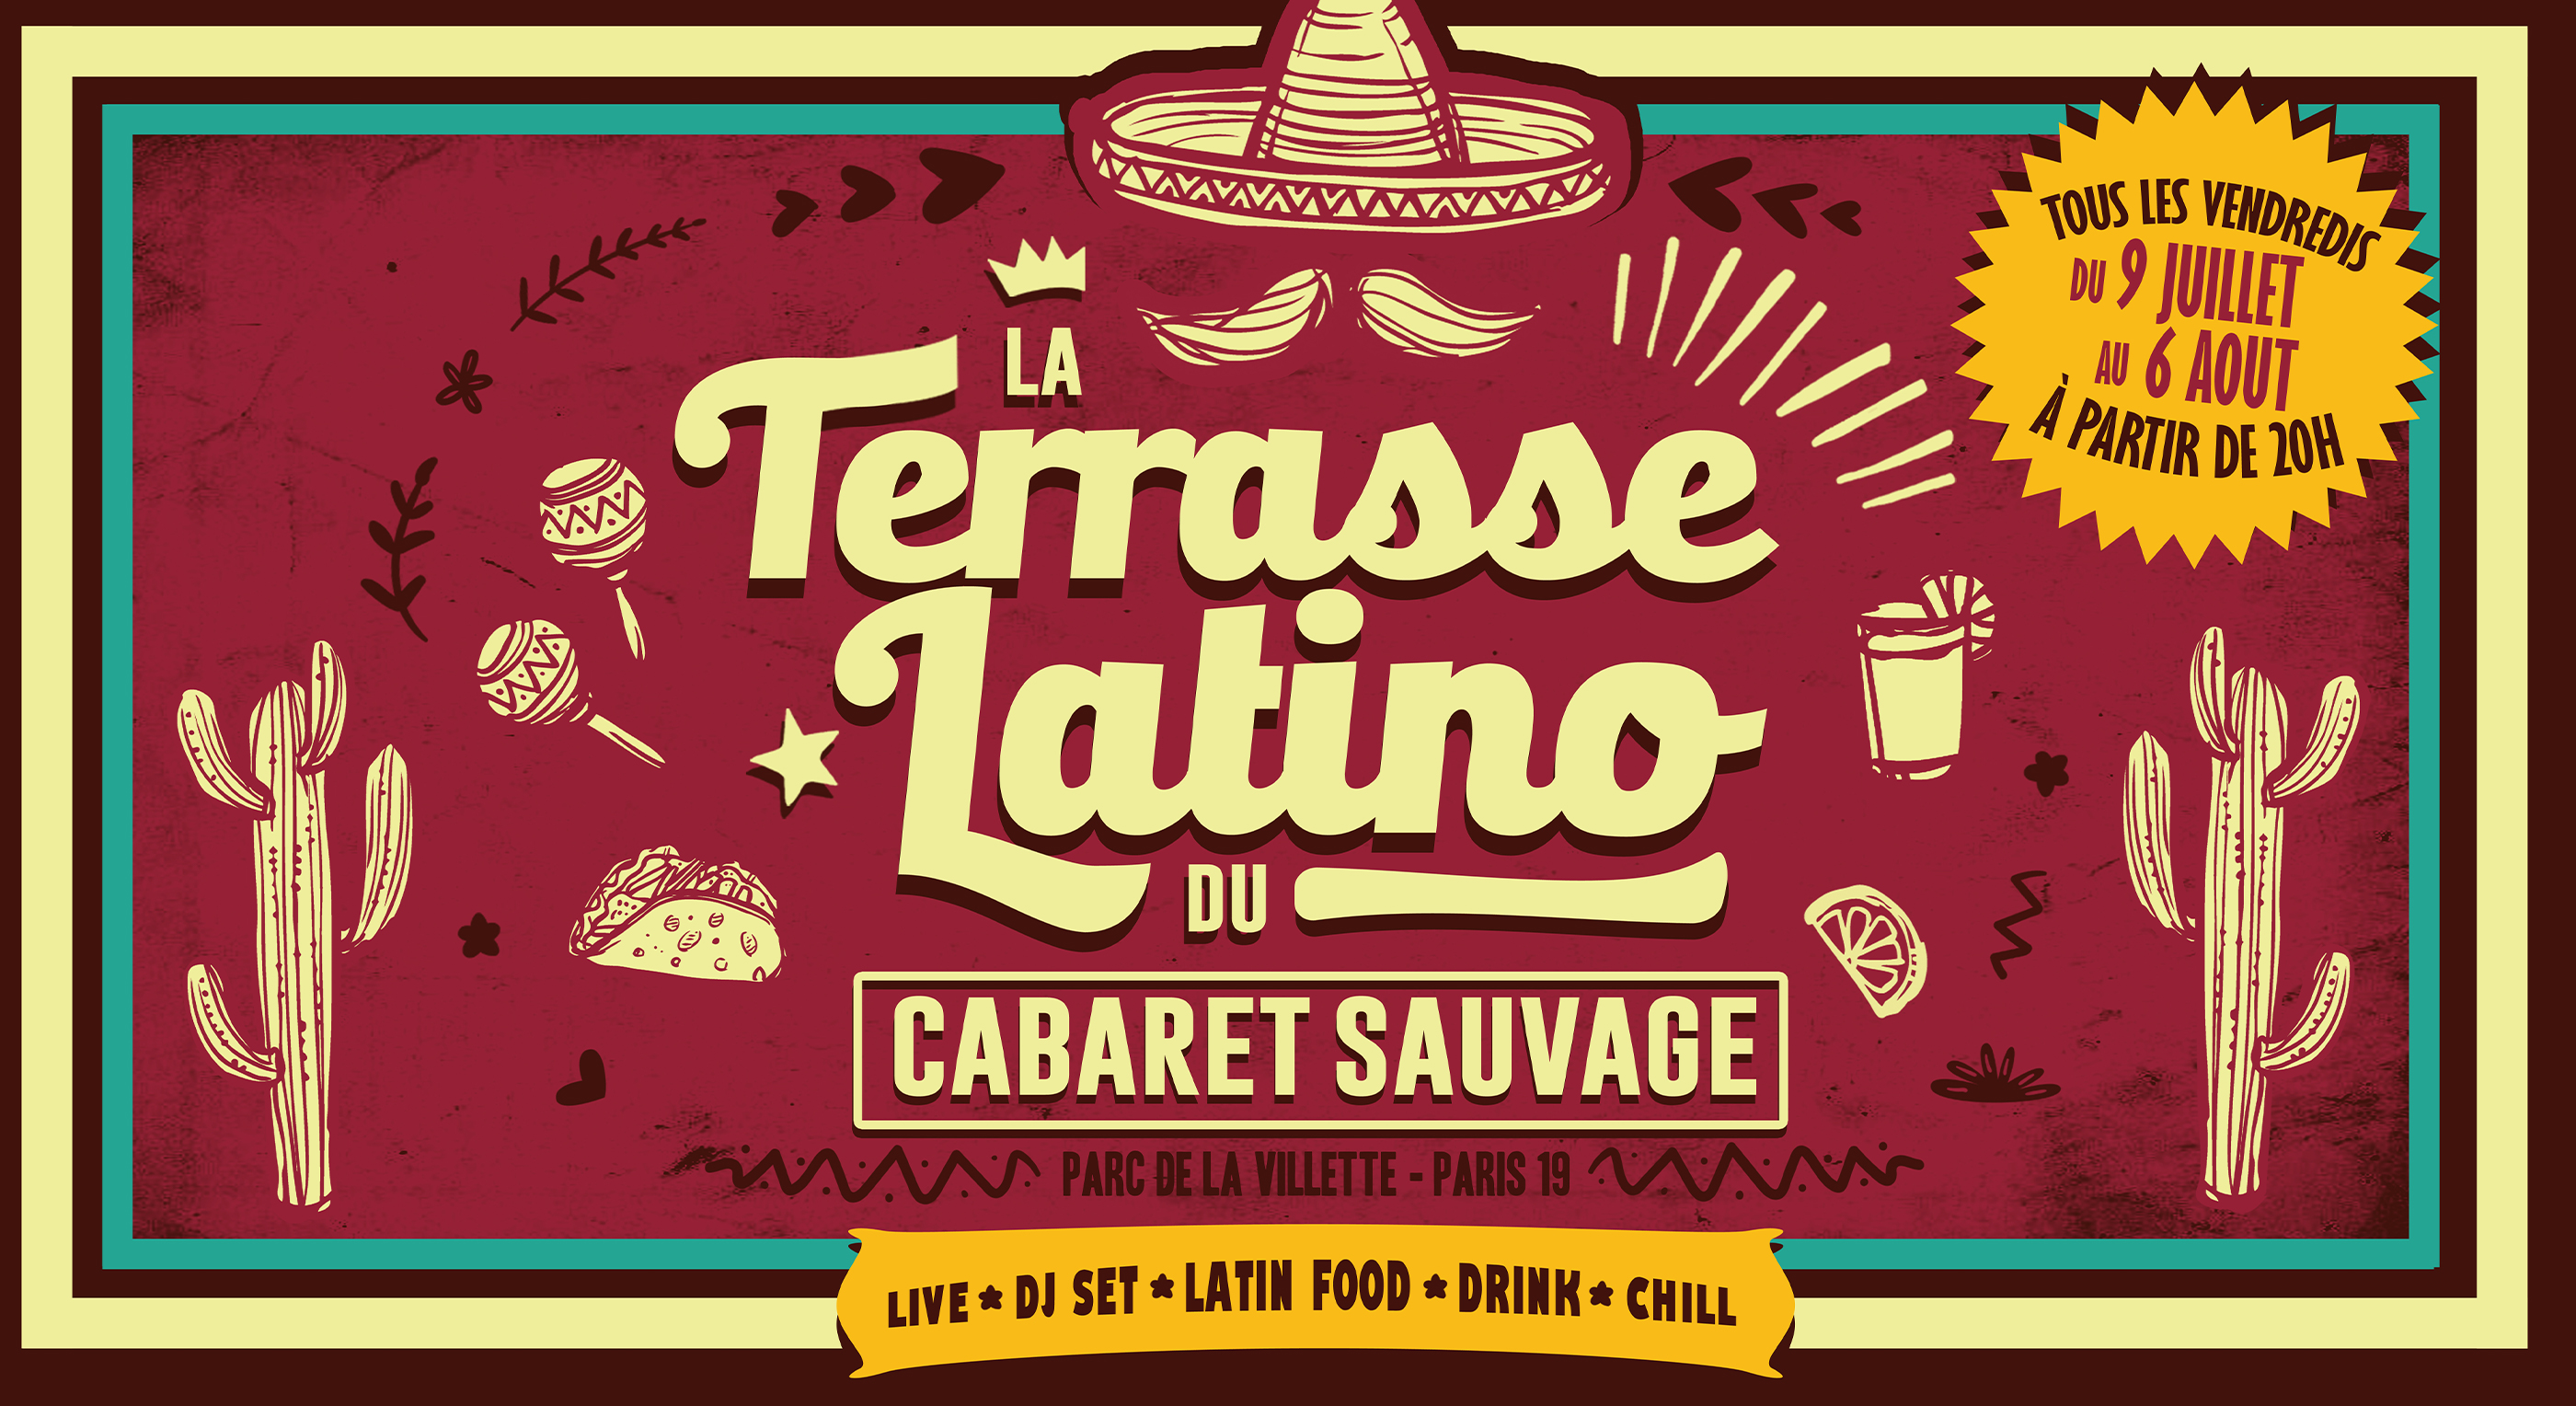 La Terrasse Latino - Vendredi 30 Juillet 2021